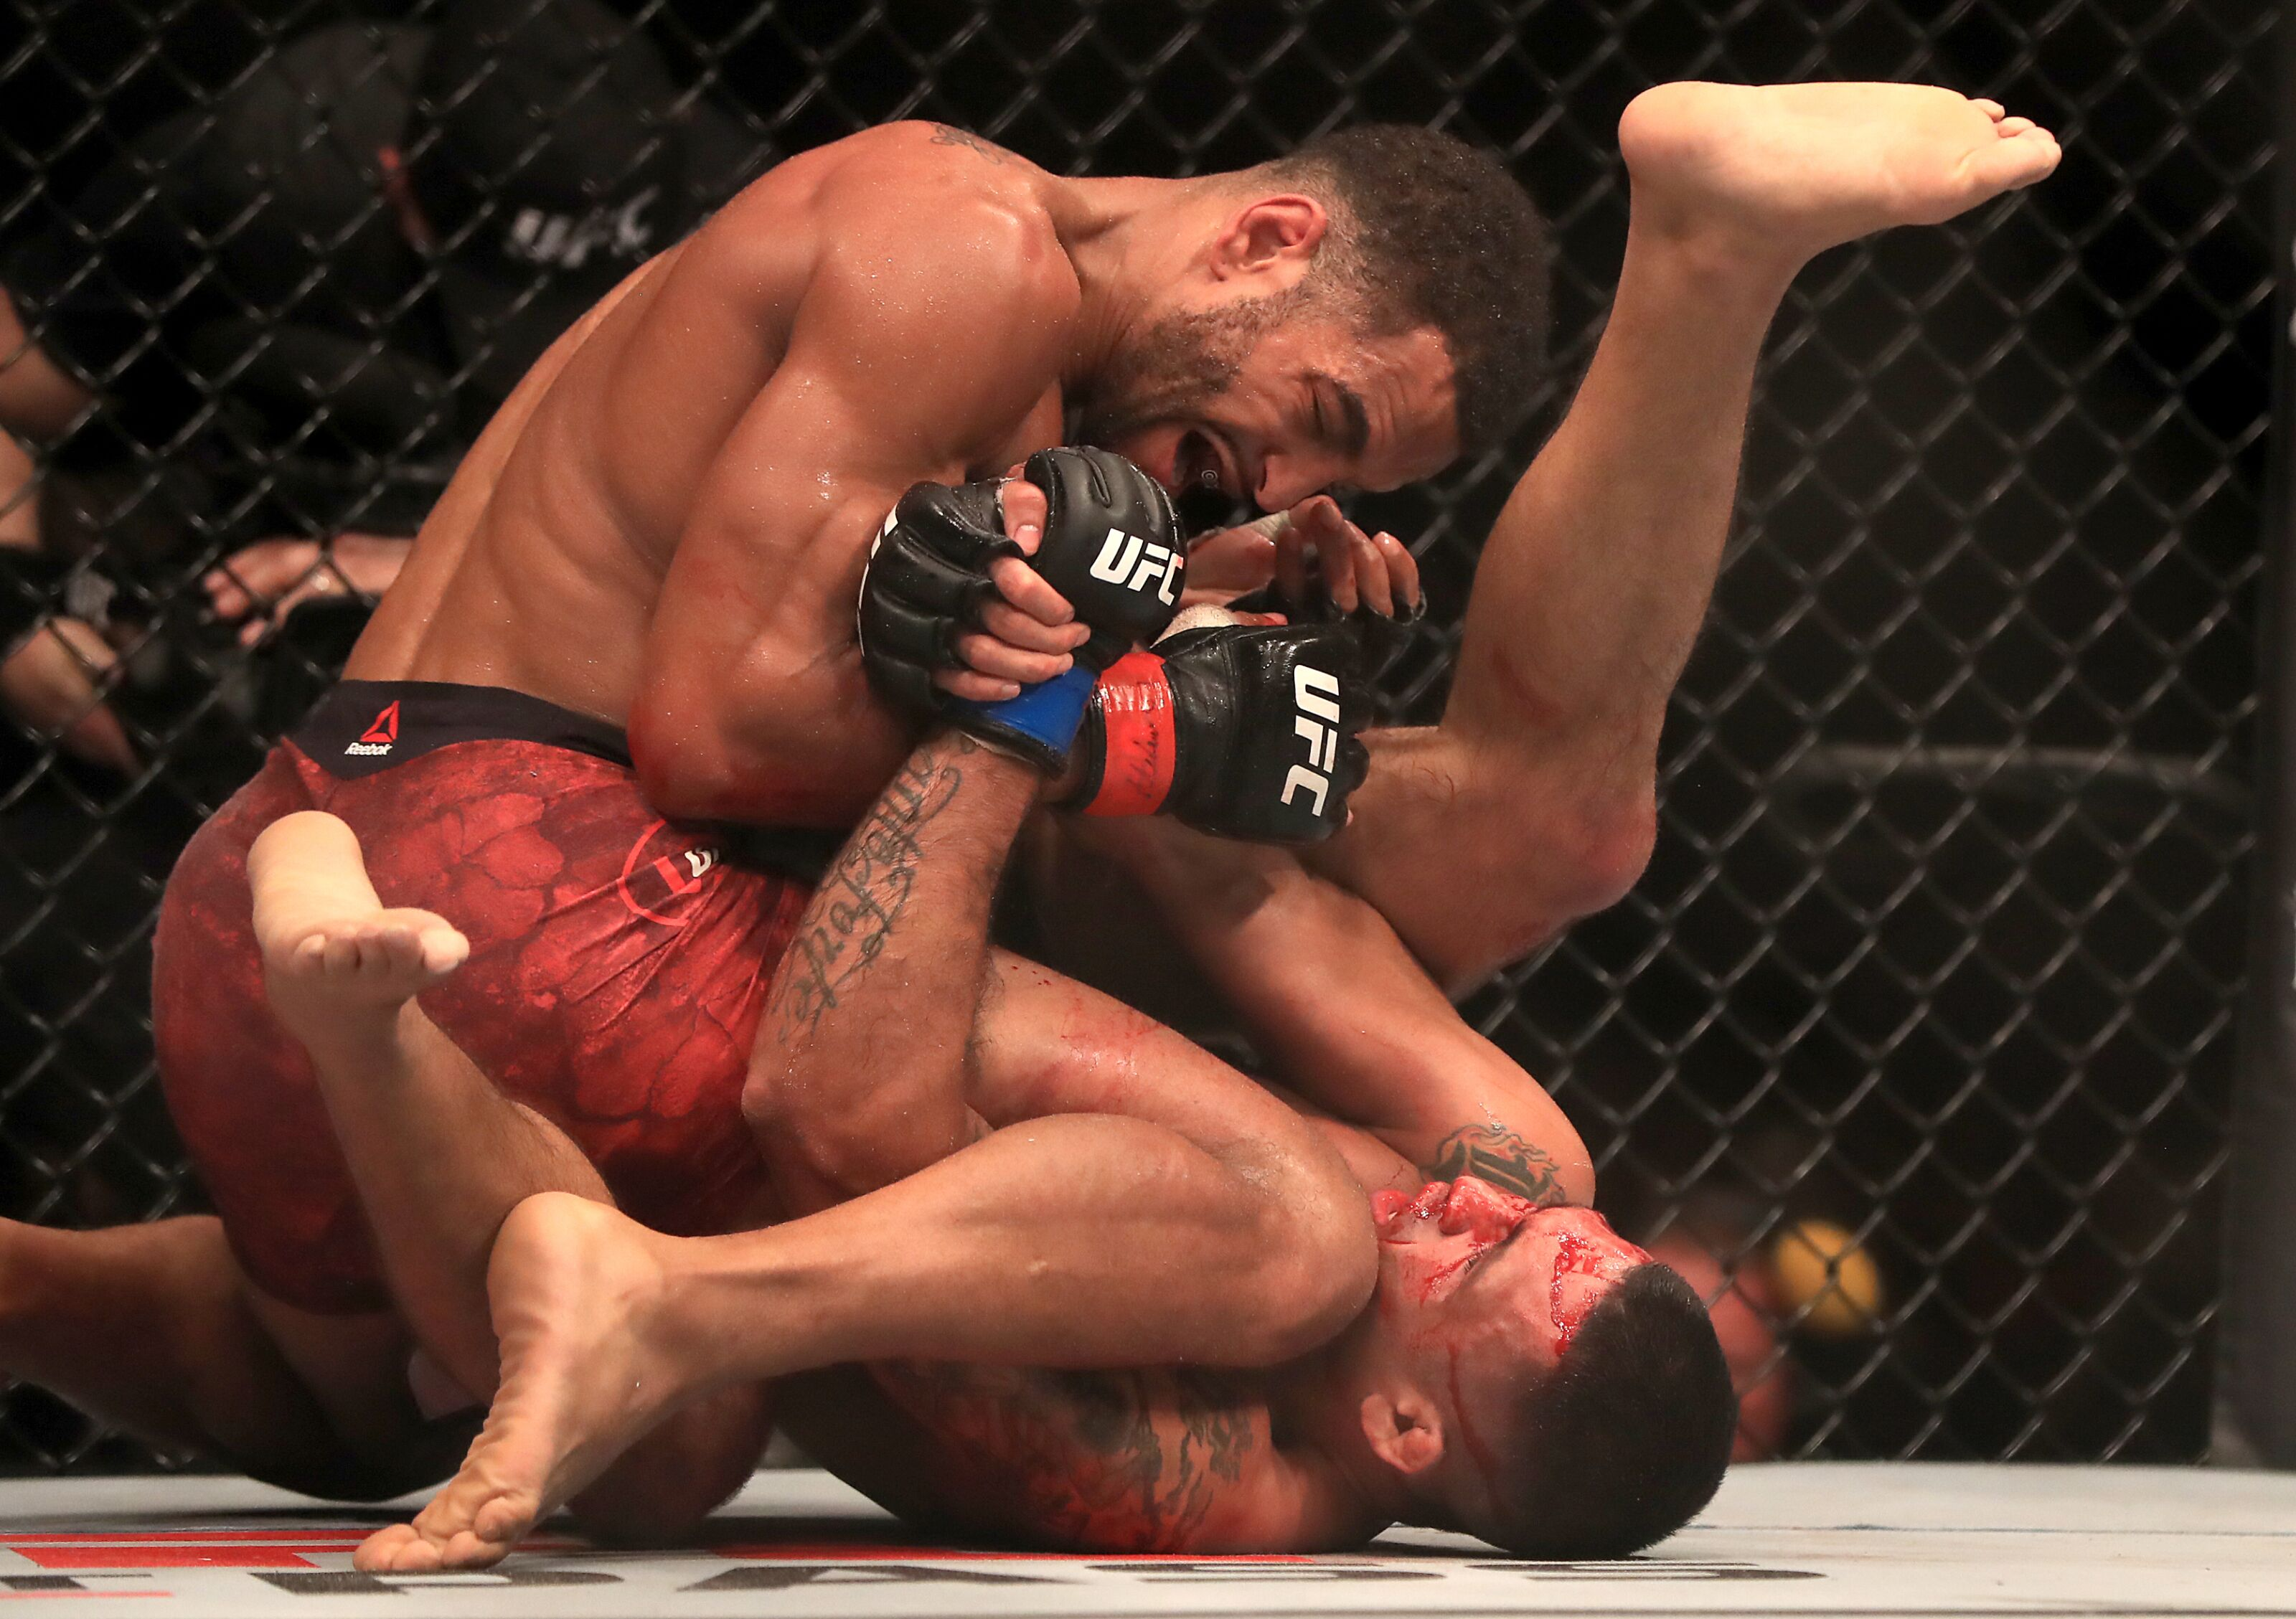 UFC London: Claudio Silva verbally taps Danny Roberts amid controversy